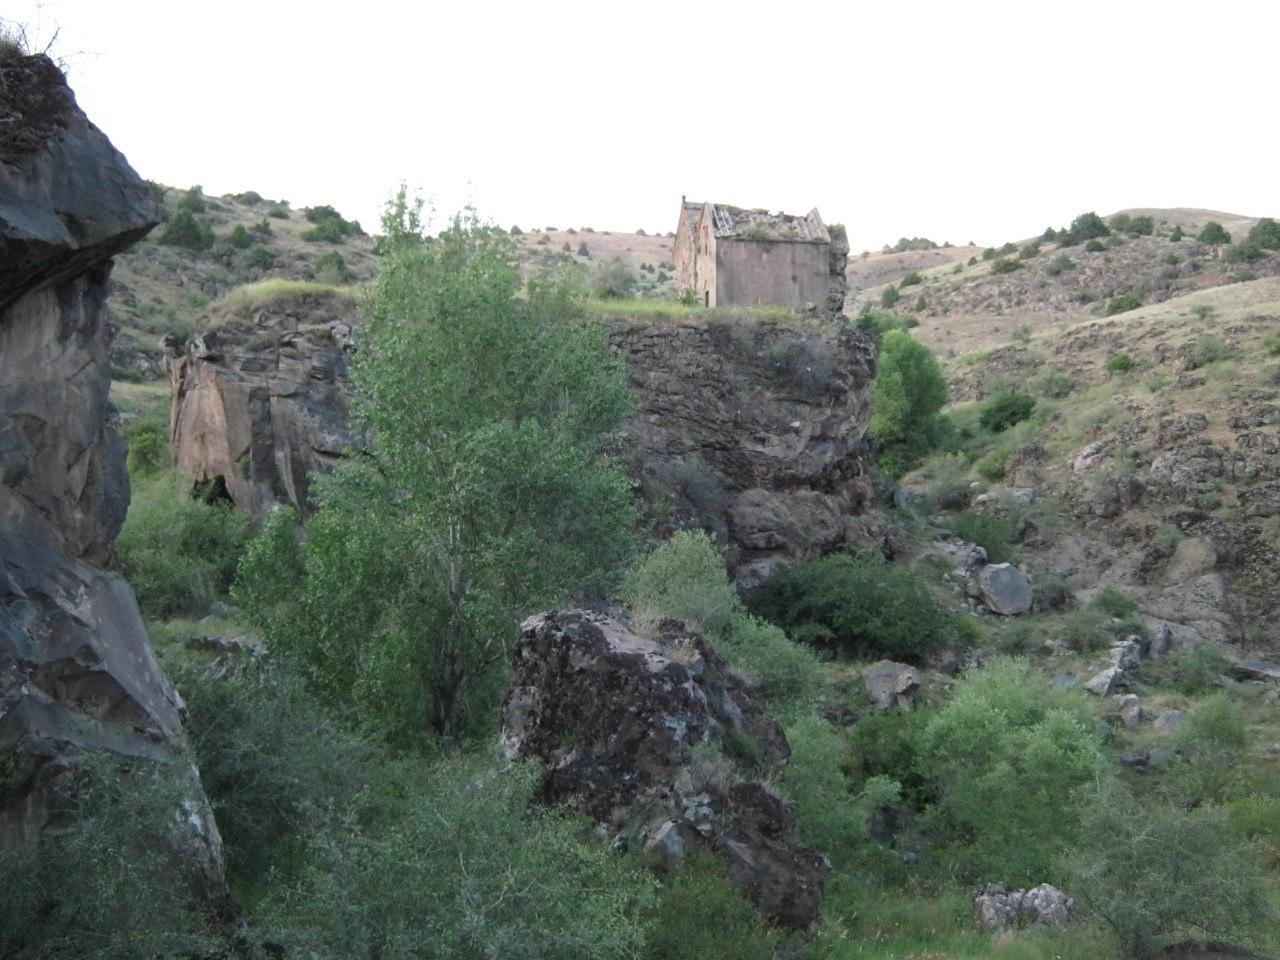 монастырь Сур Сион в селе Хере Хер